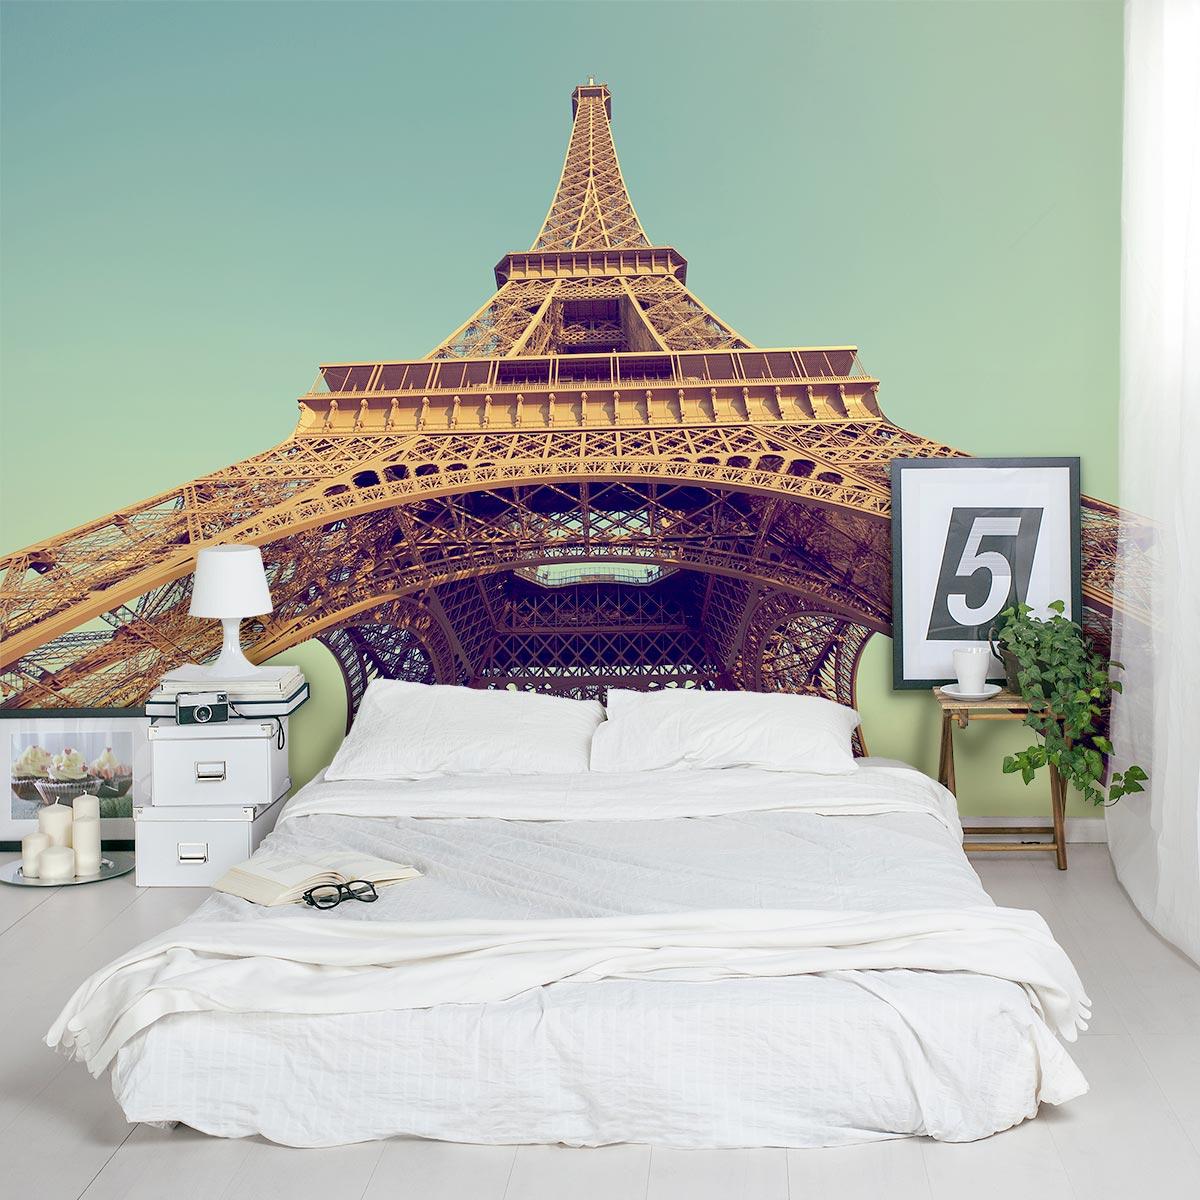 Retro Eiffel Tower Wall Mural